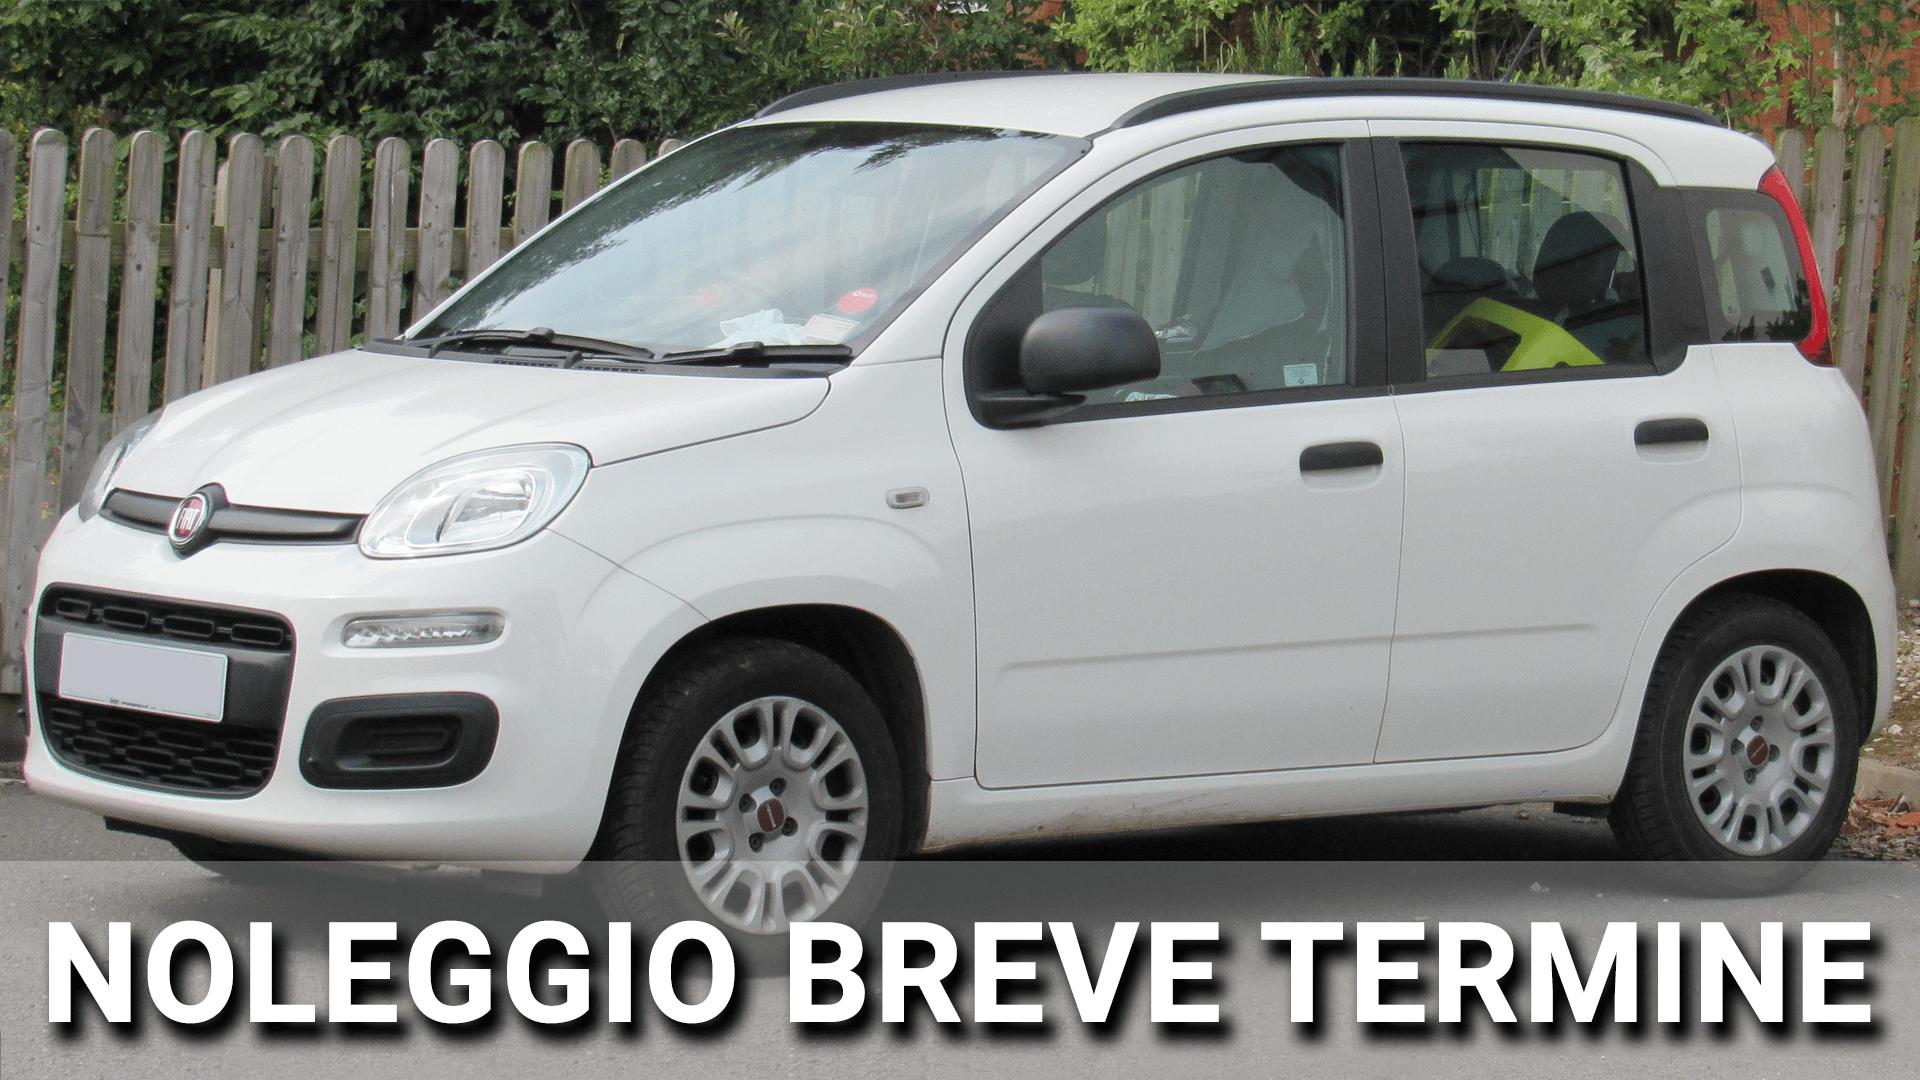 bizioli_noleggio_breve_termine-min